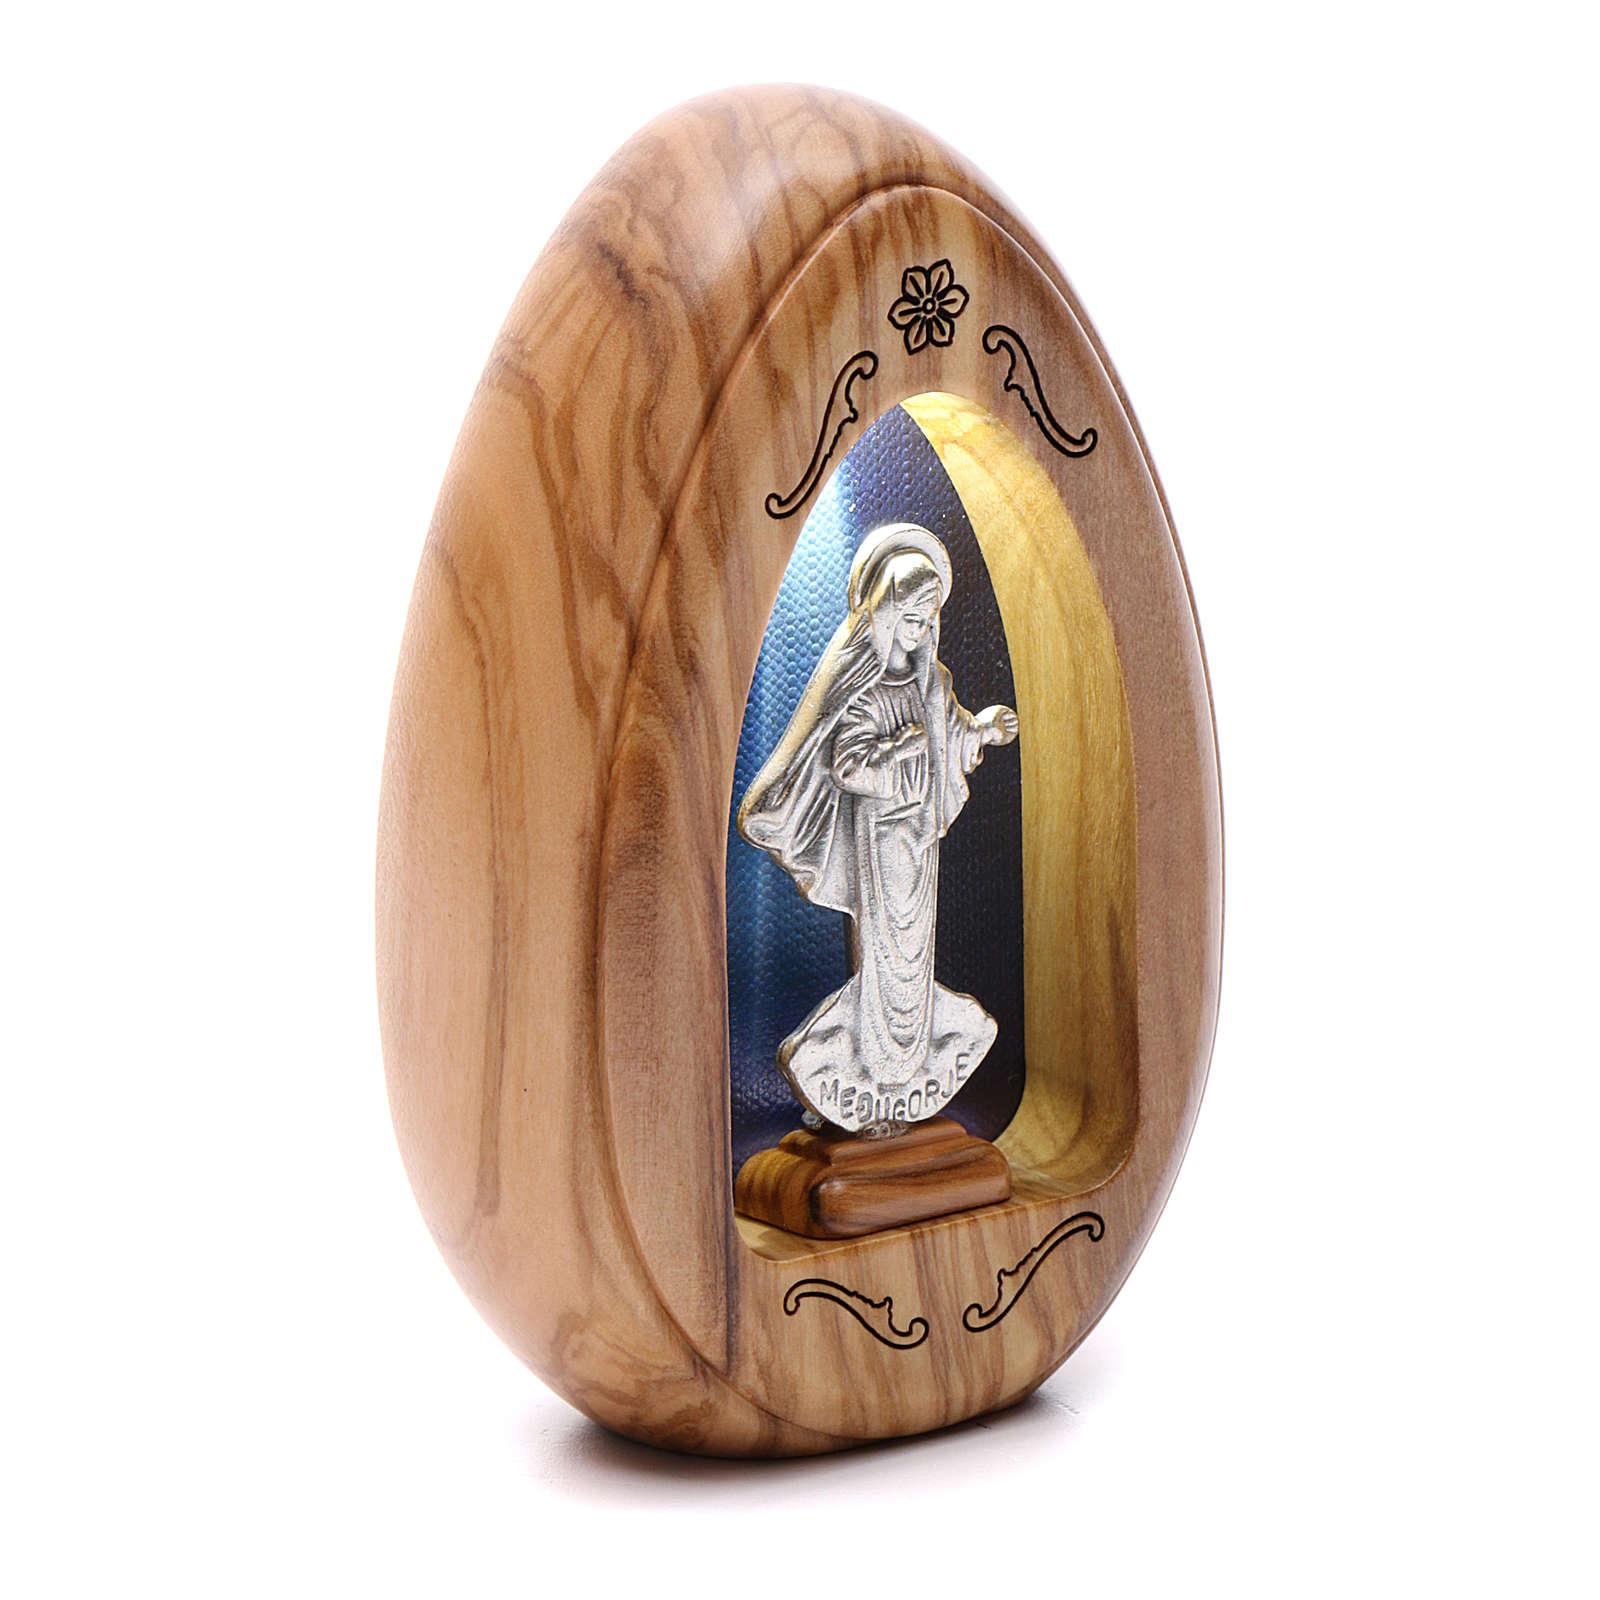 Lamparilla de madera de olivo Virgen de Medjugorje con led 10x7 cm 3